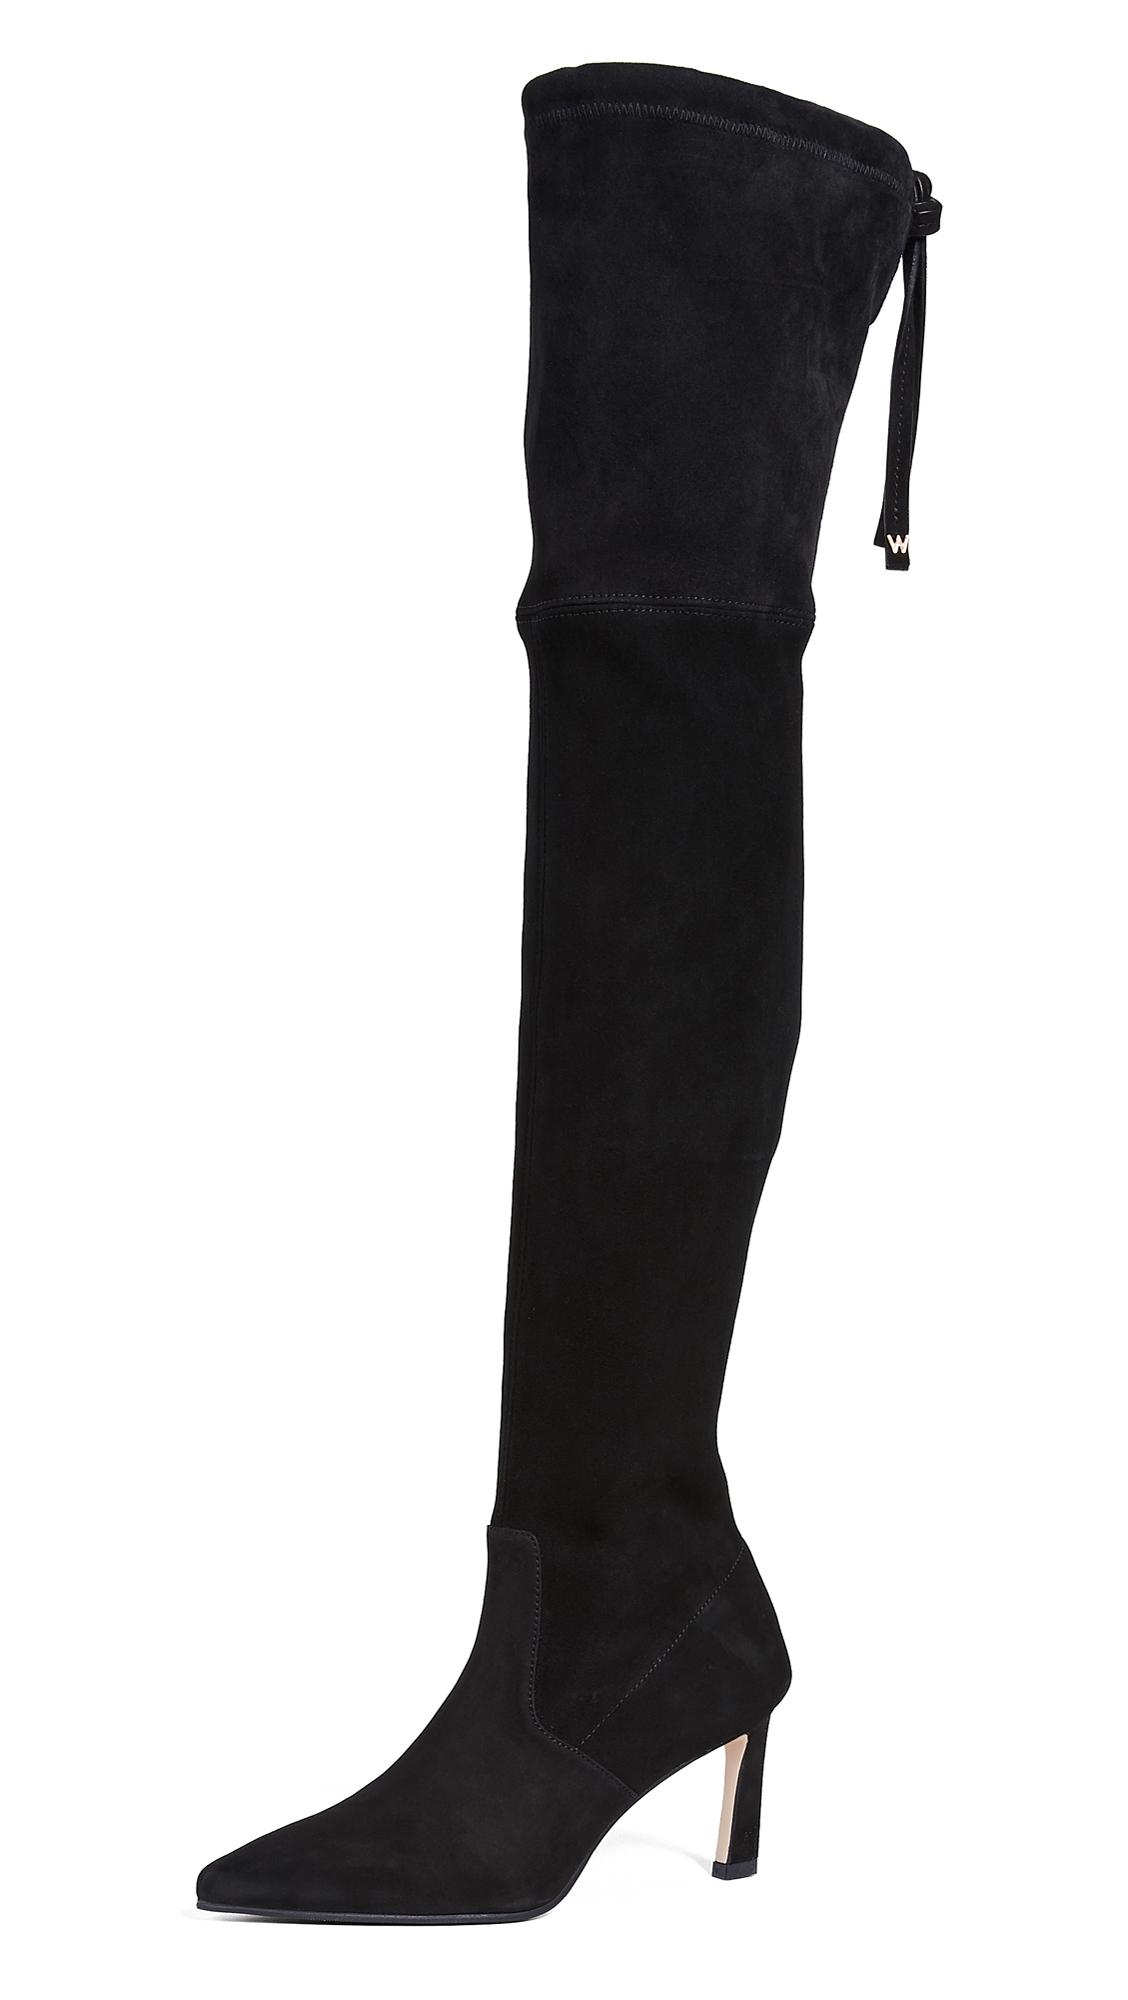 Stuart Weitzman Natalia 75mm Boots - Black